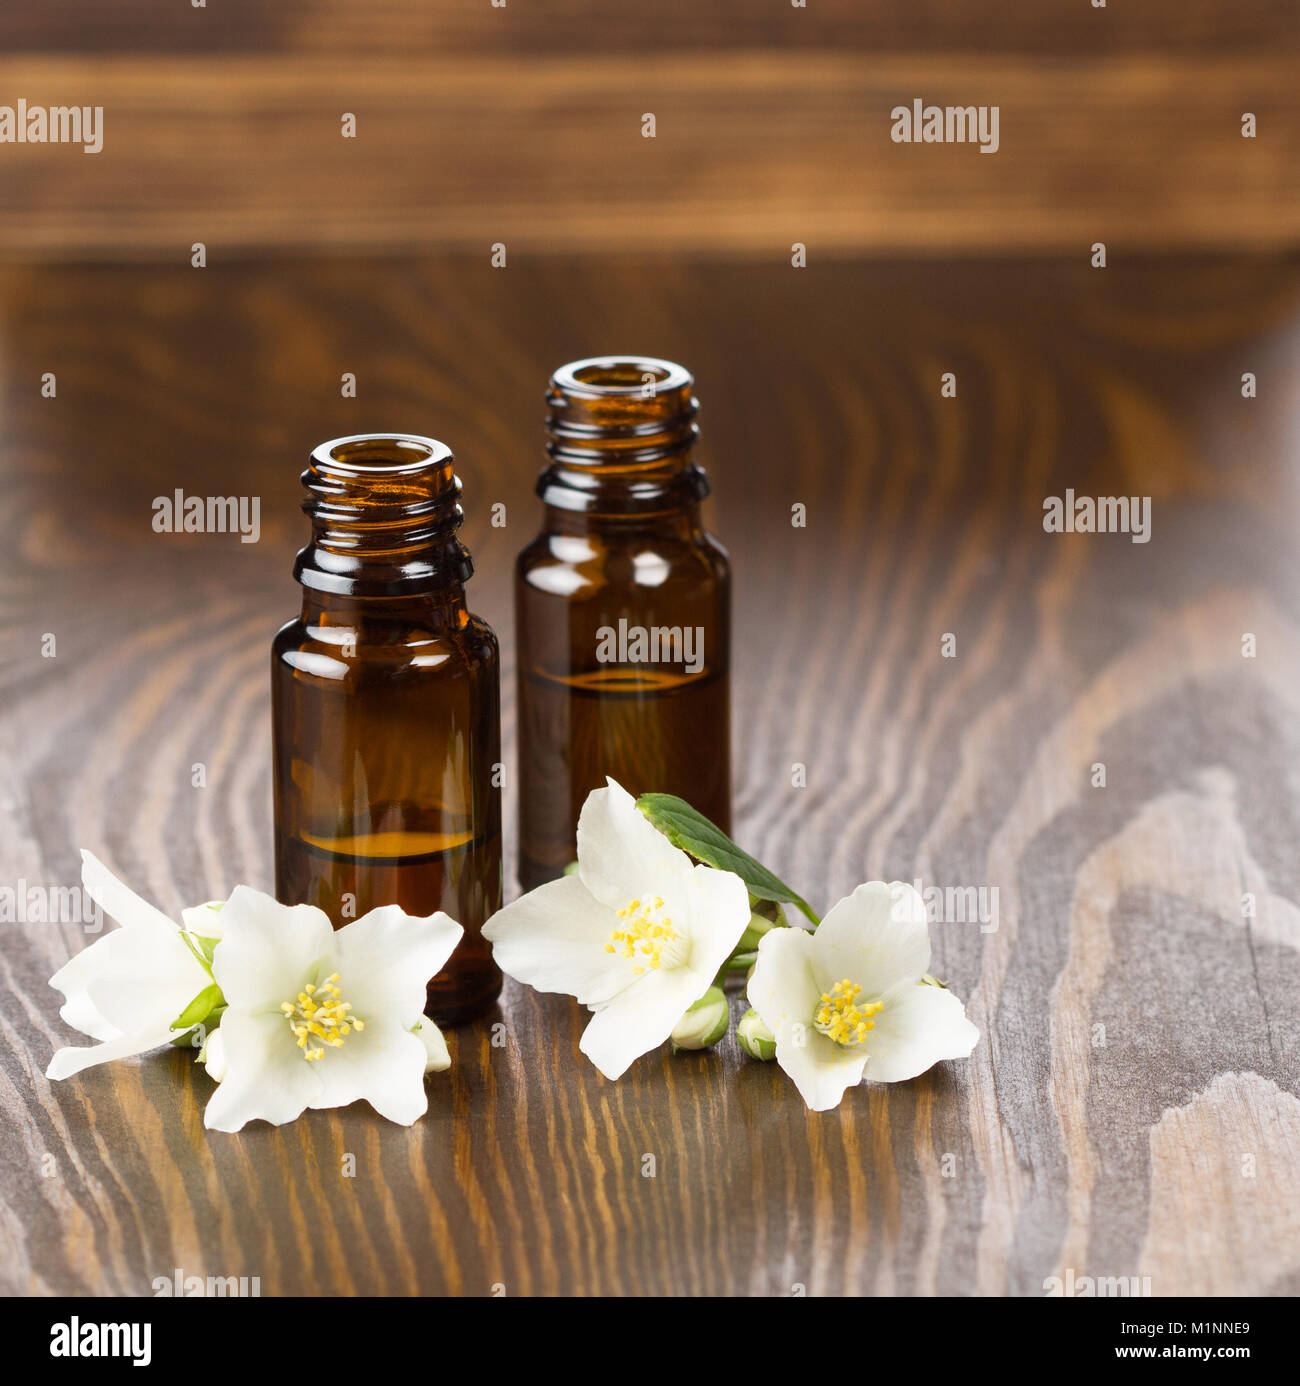 Jasmine Essential Oil And Jasmine Flowers Stock Photo 173196193 Alamy